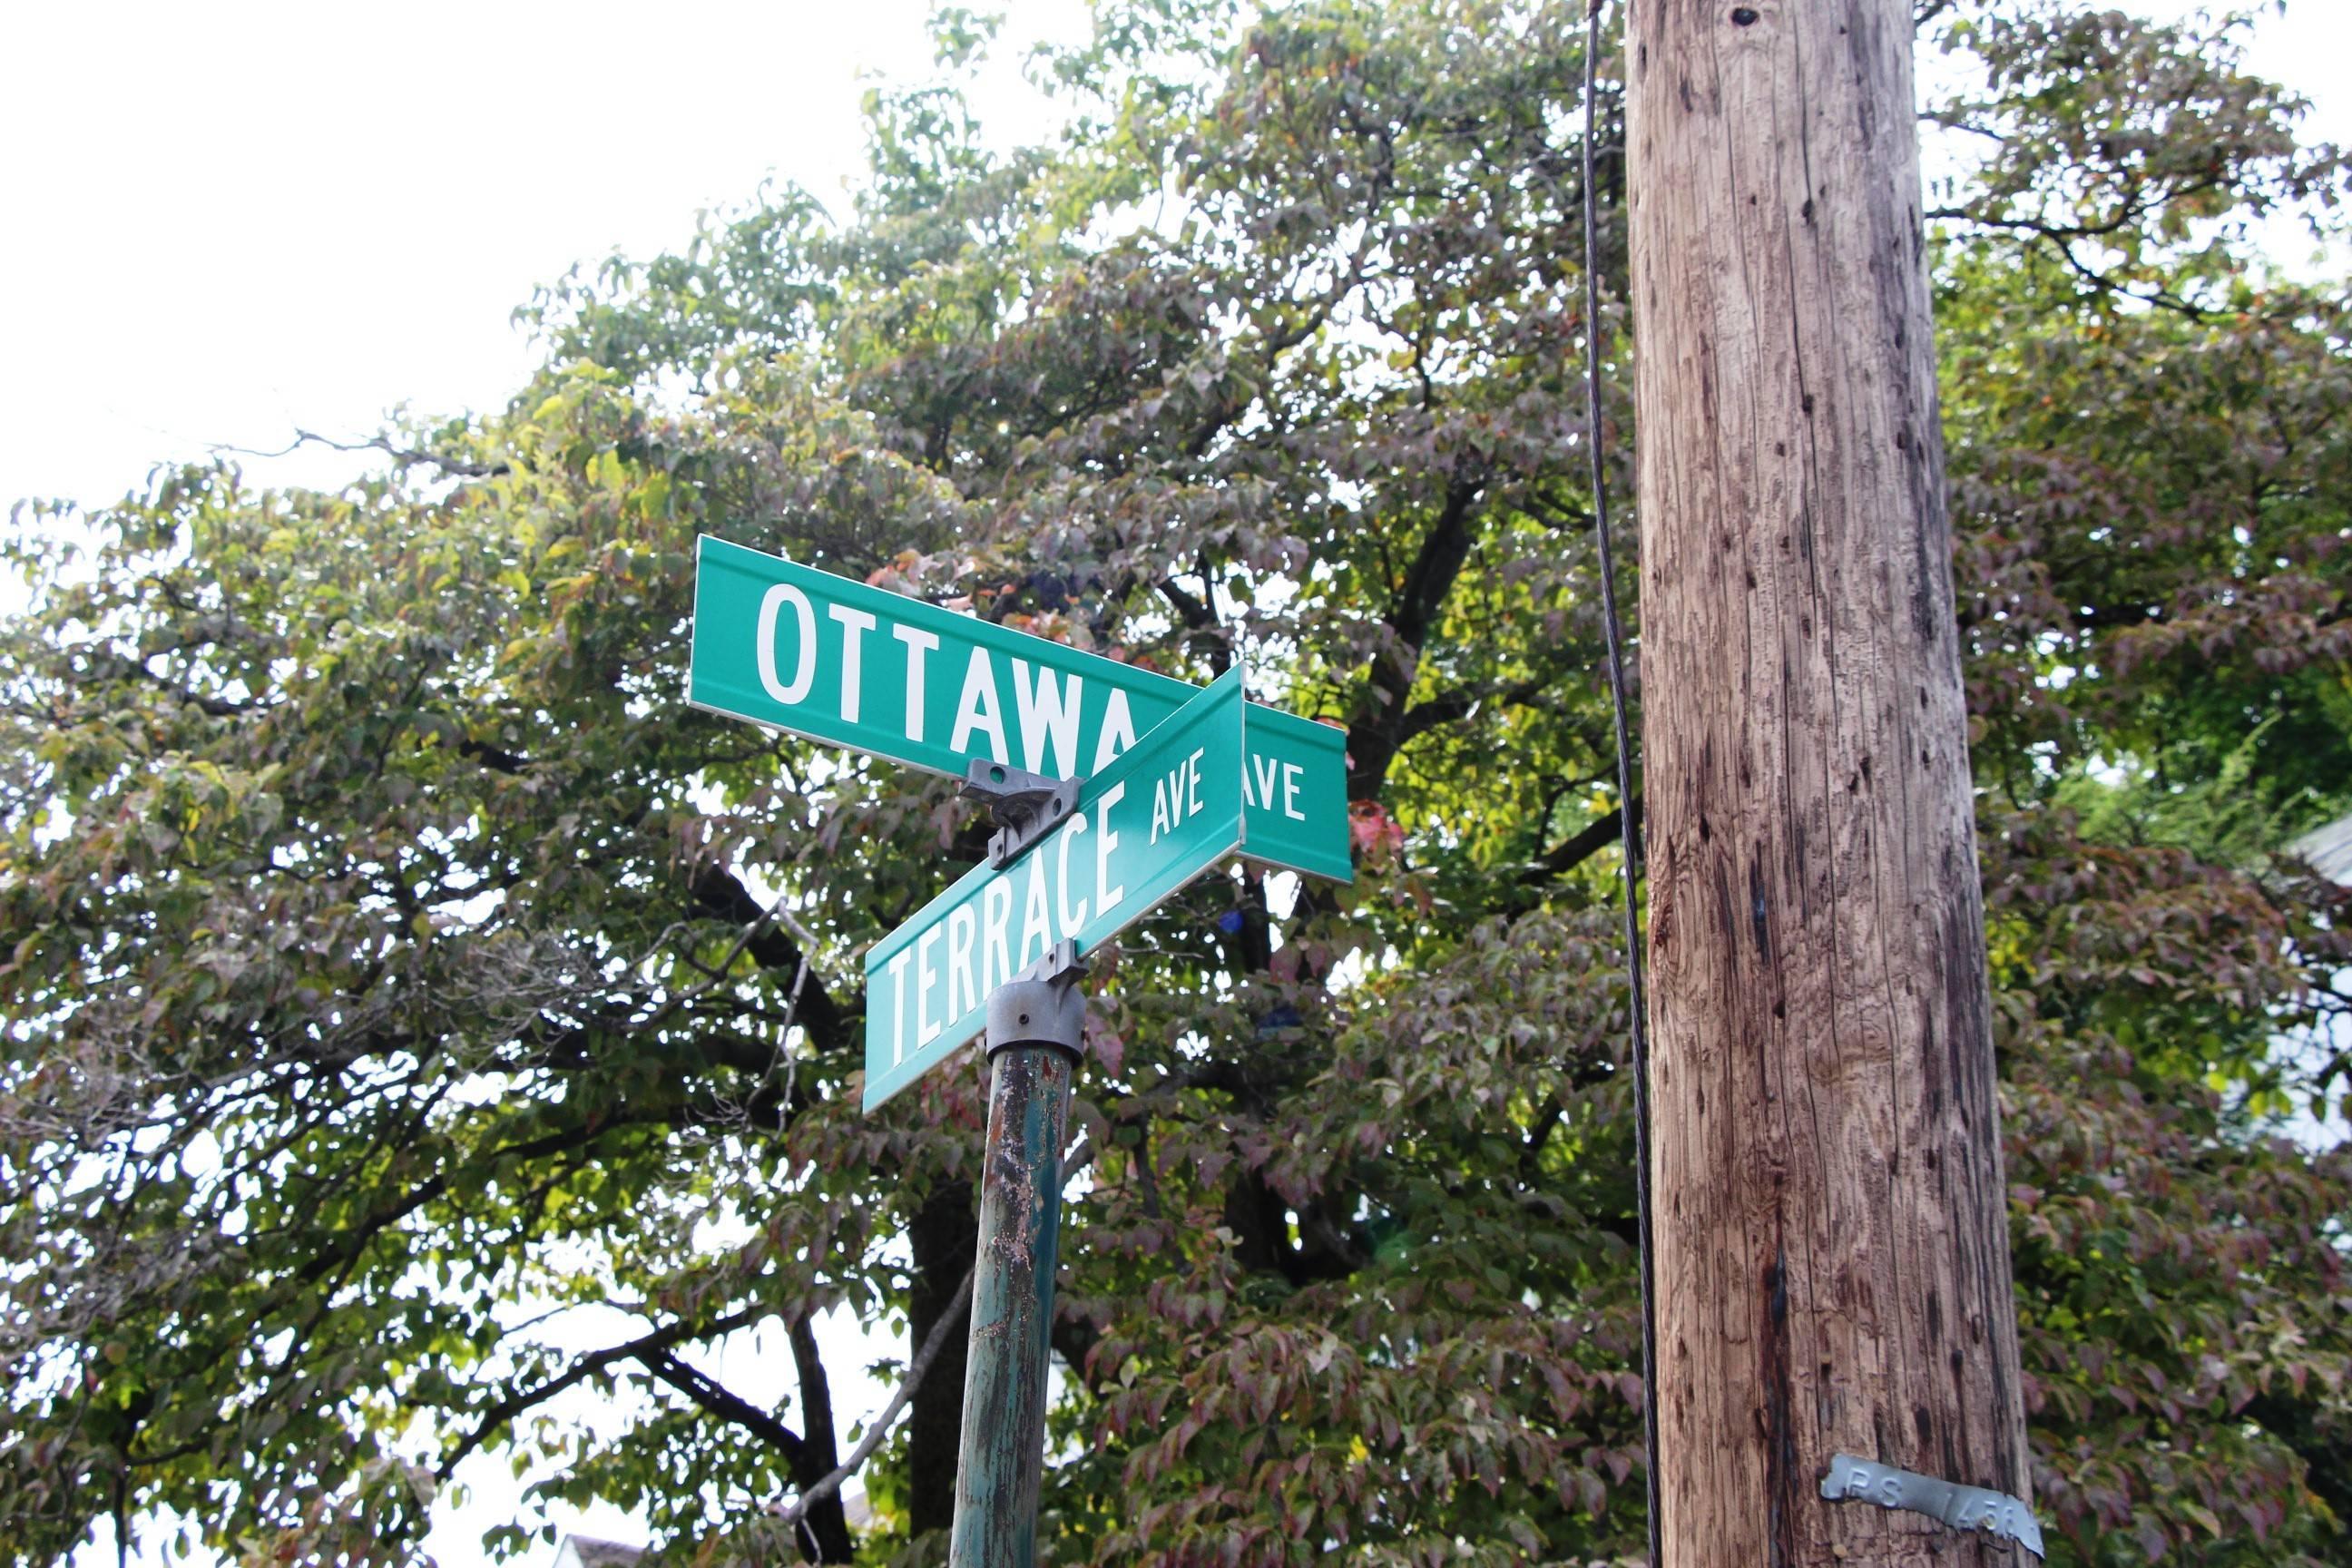 9388ab71686589e7c8a9_EDIT_Ottawa_and_Terrace_street_signs.jpg